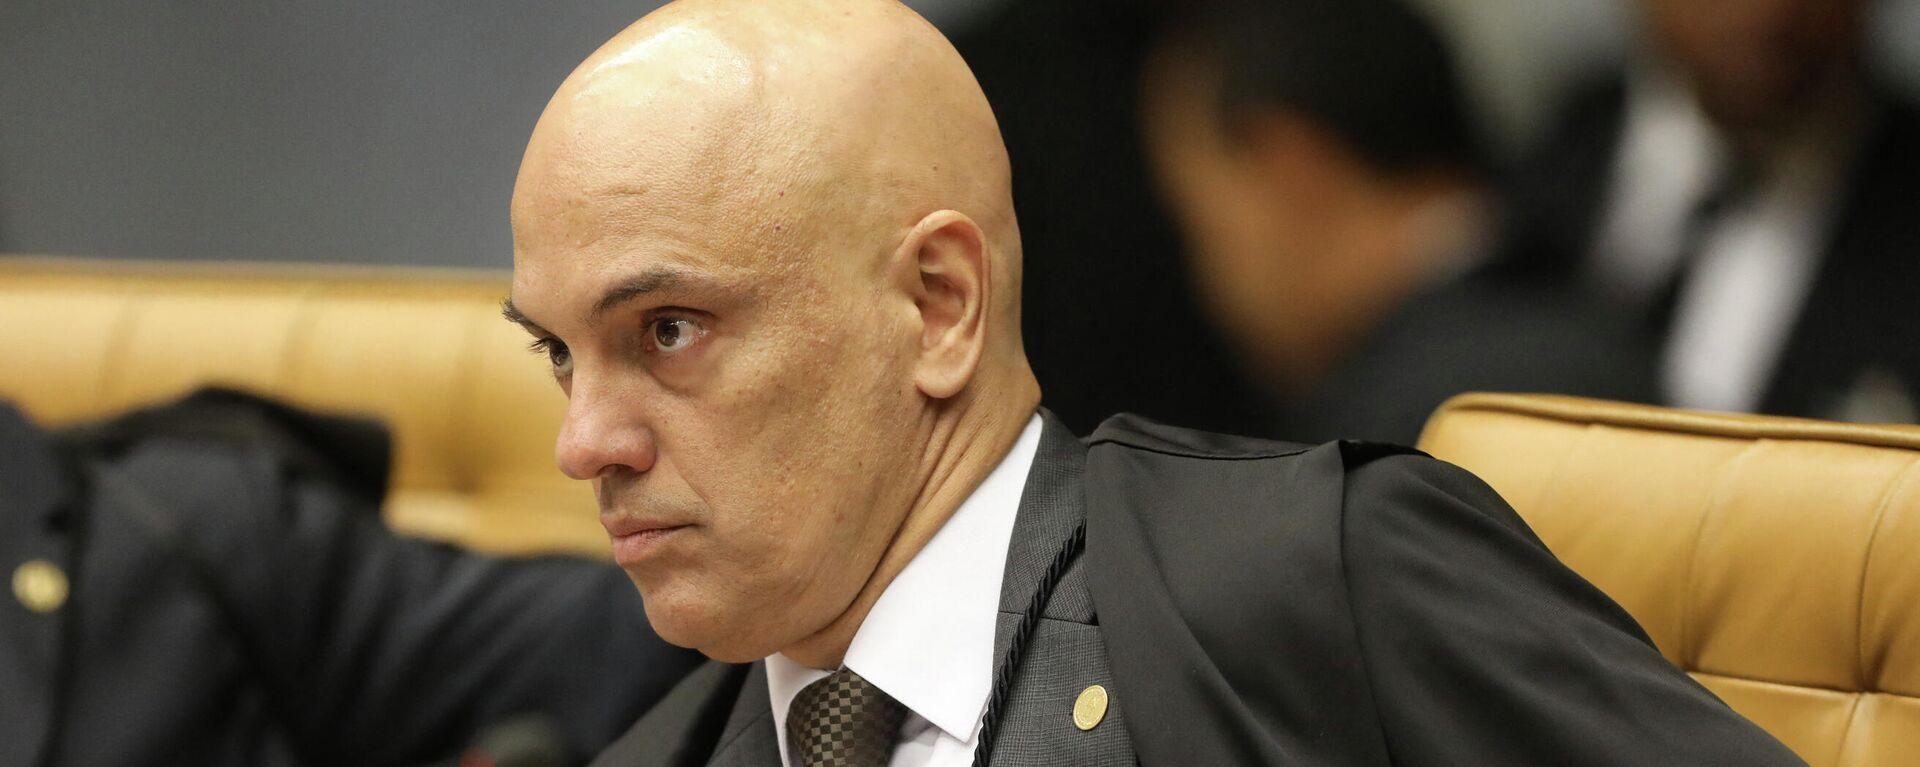 Alexandre de Moraes, juez del Tribunal Supremo Federal de Brasil  - Sputnik Mundo, 1920, 01.07.2021